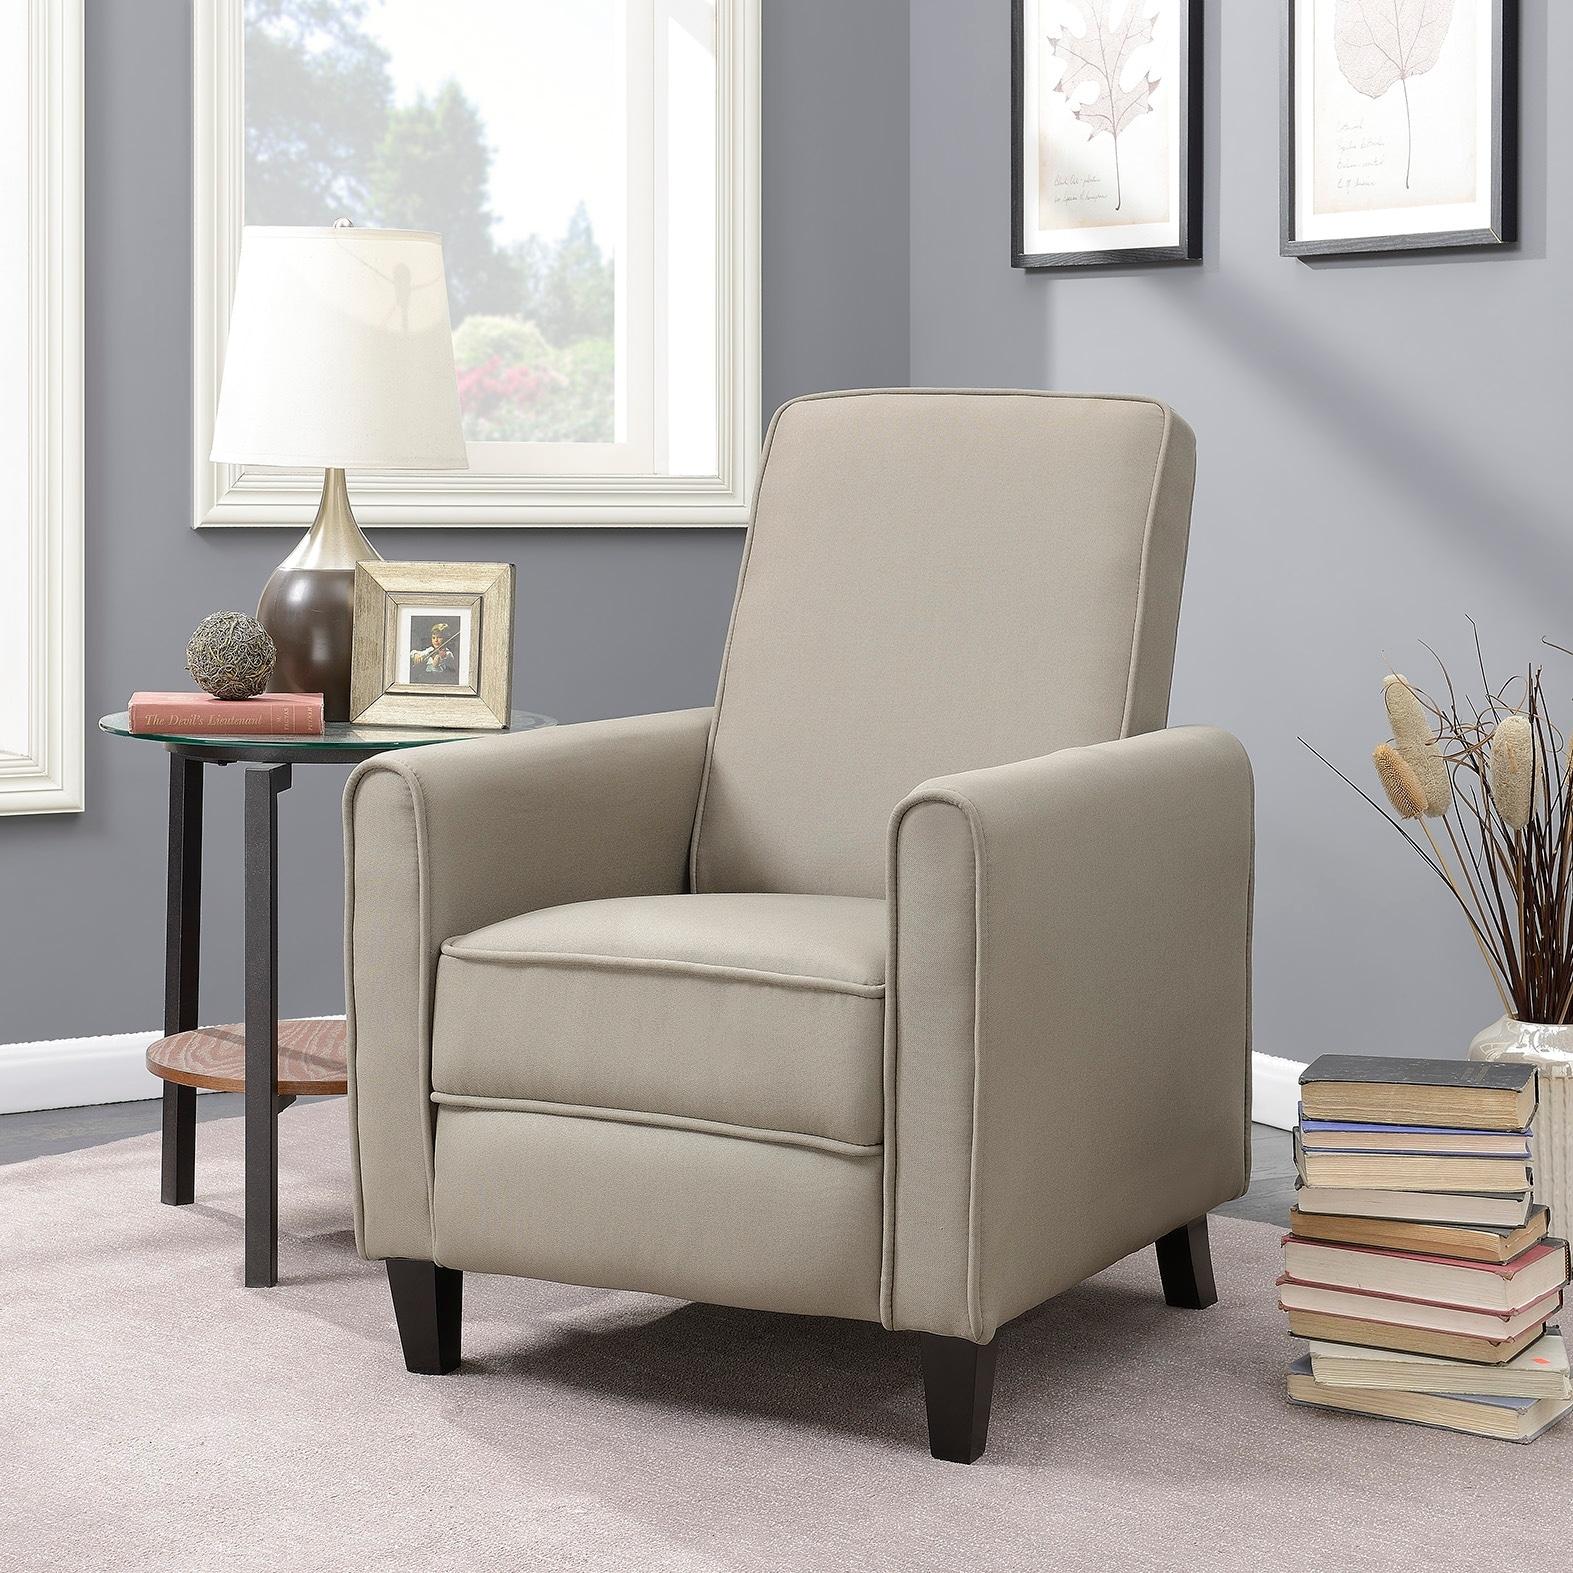 Belleze Modern Recliner Club Chair Accent Living Room Linen W Footrest Taupe